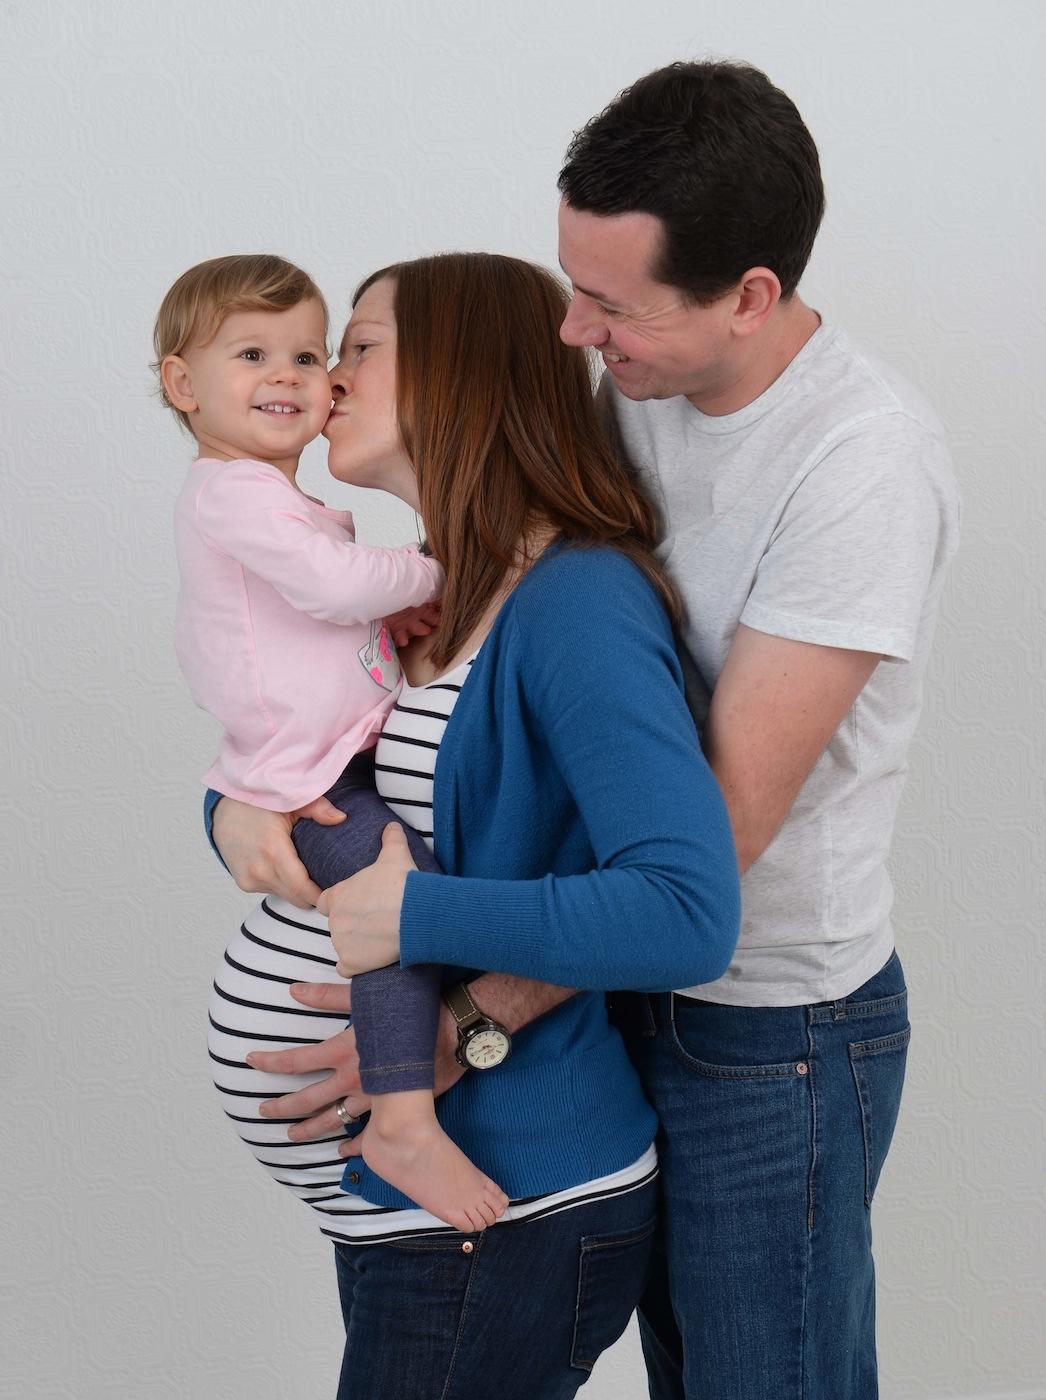 lower mainland maternity photographer